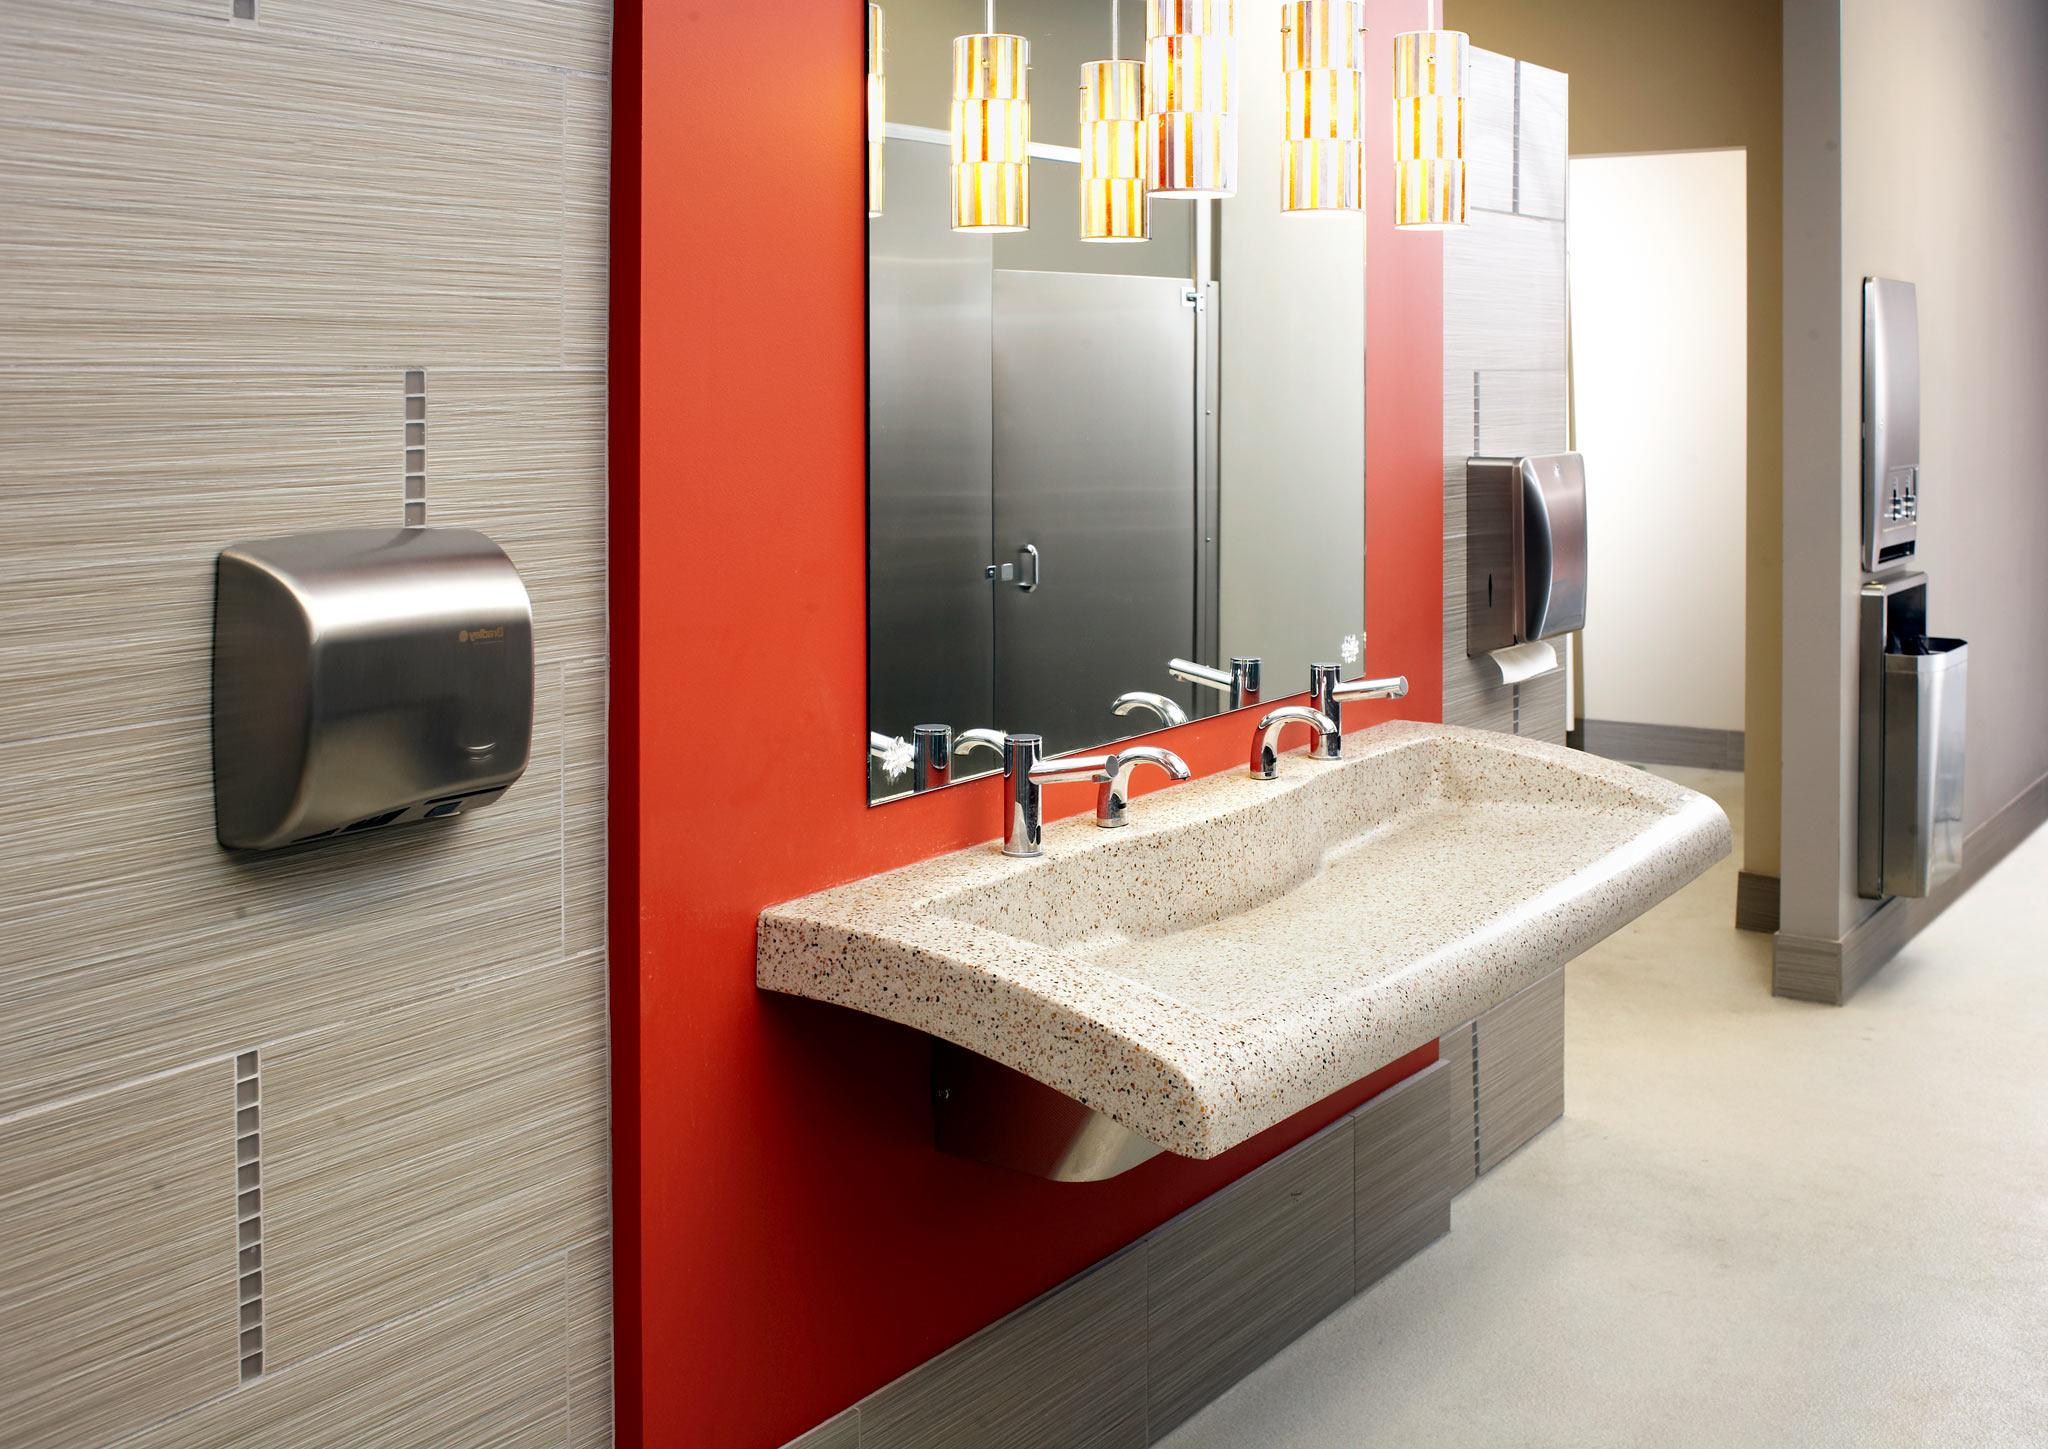 Bradley - Lavatory Verge System VGD-Seriesred-and-tan-verge-restroom